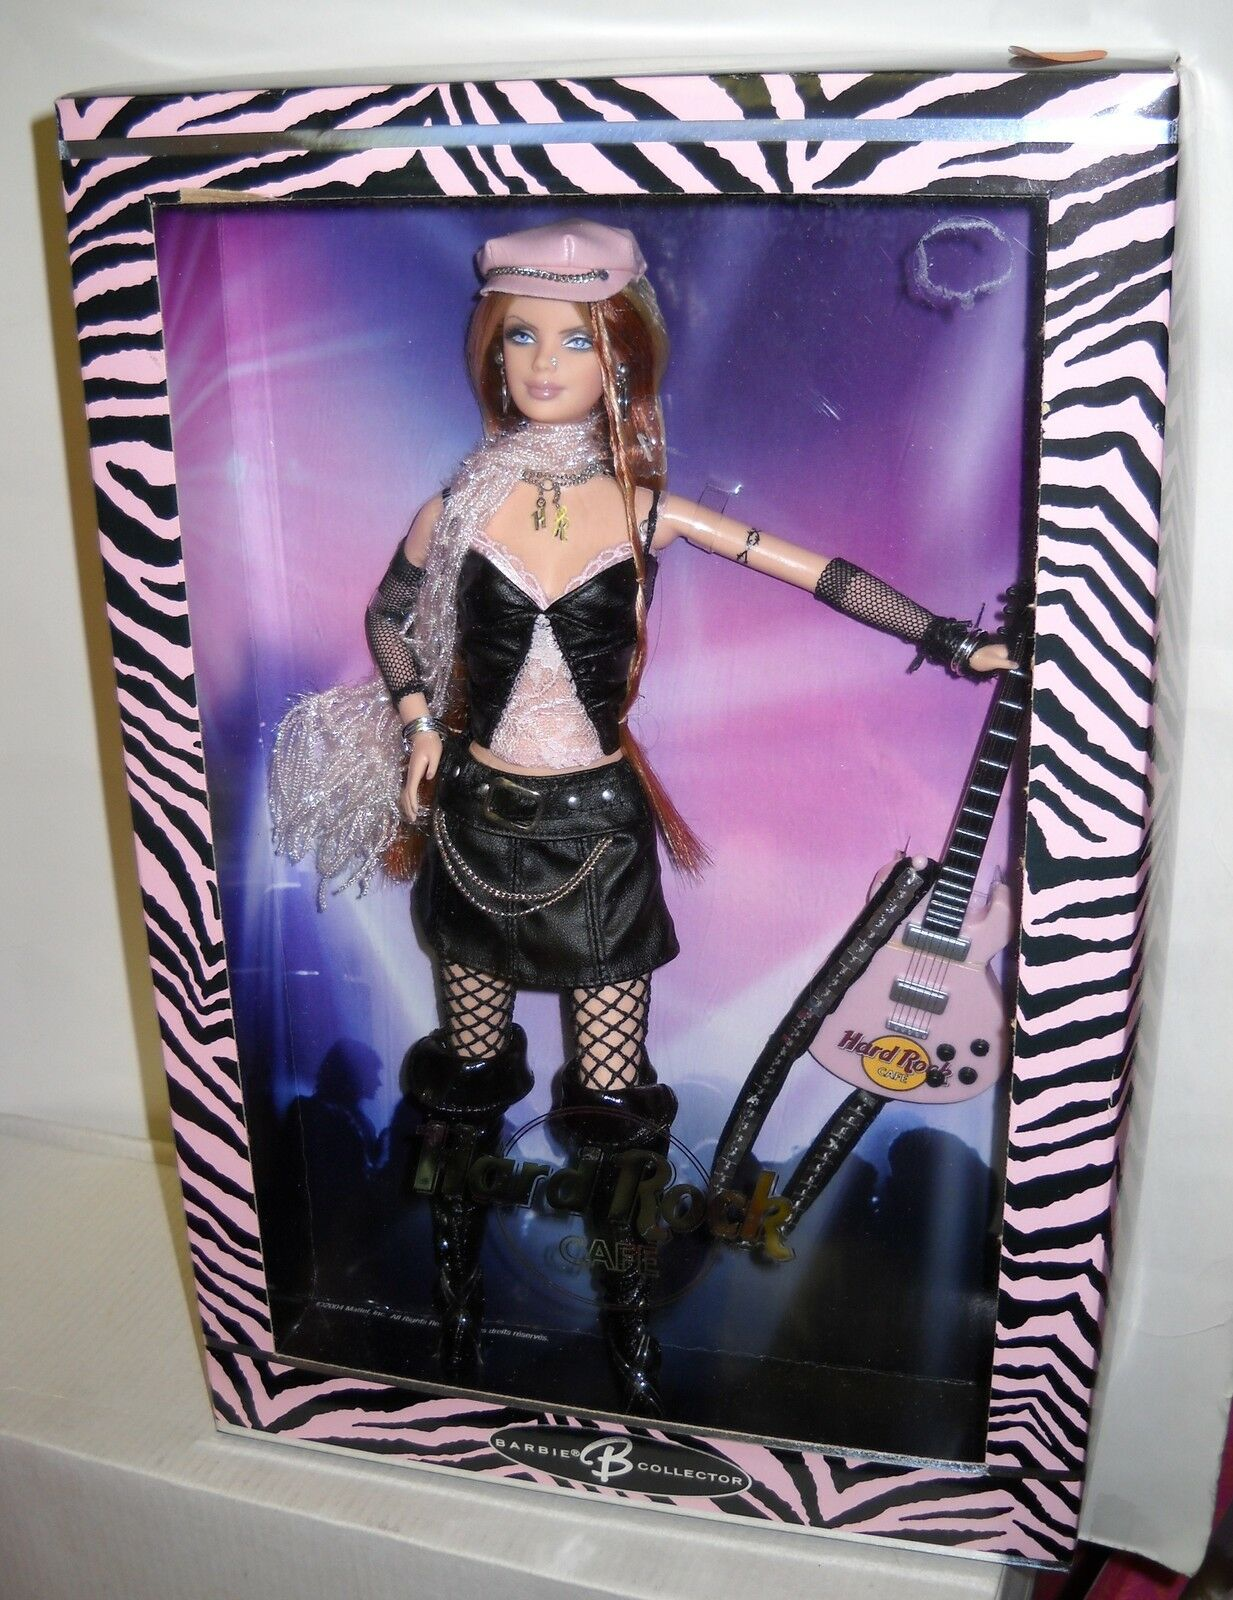 4510 NRFB Mattel Pop Culture Hard Rock Cafe Barbie 2nd in Series